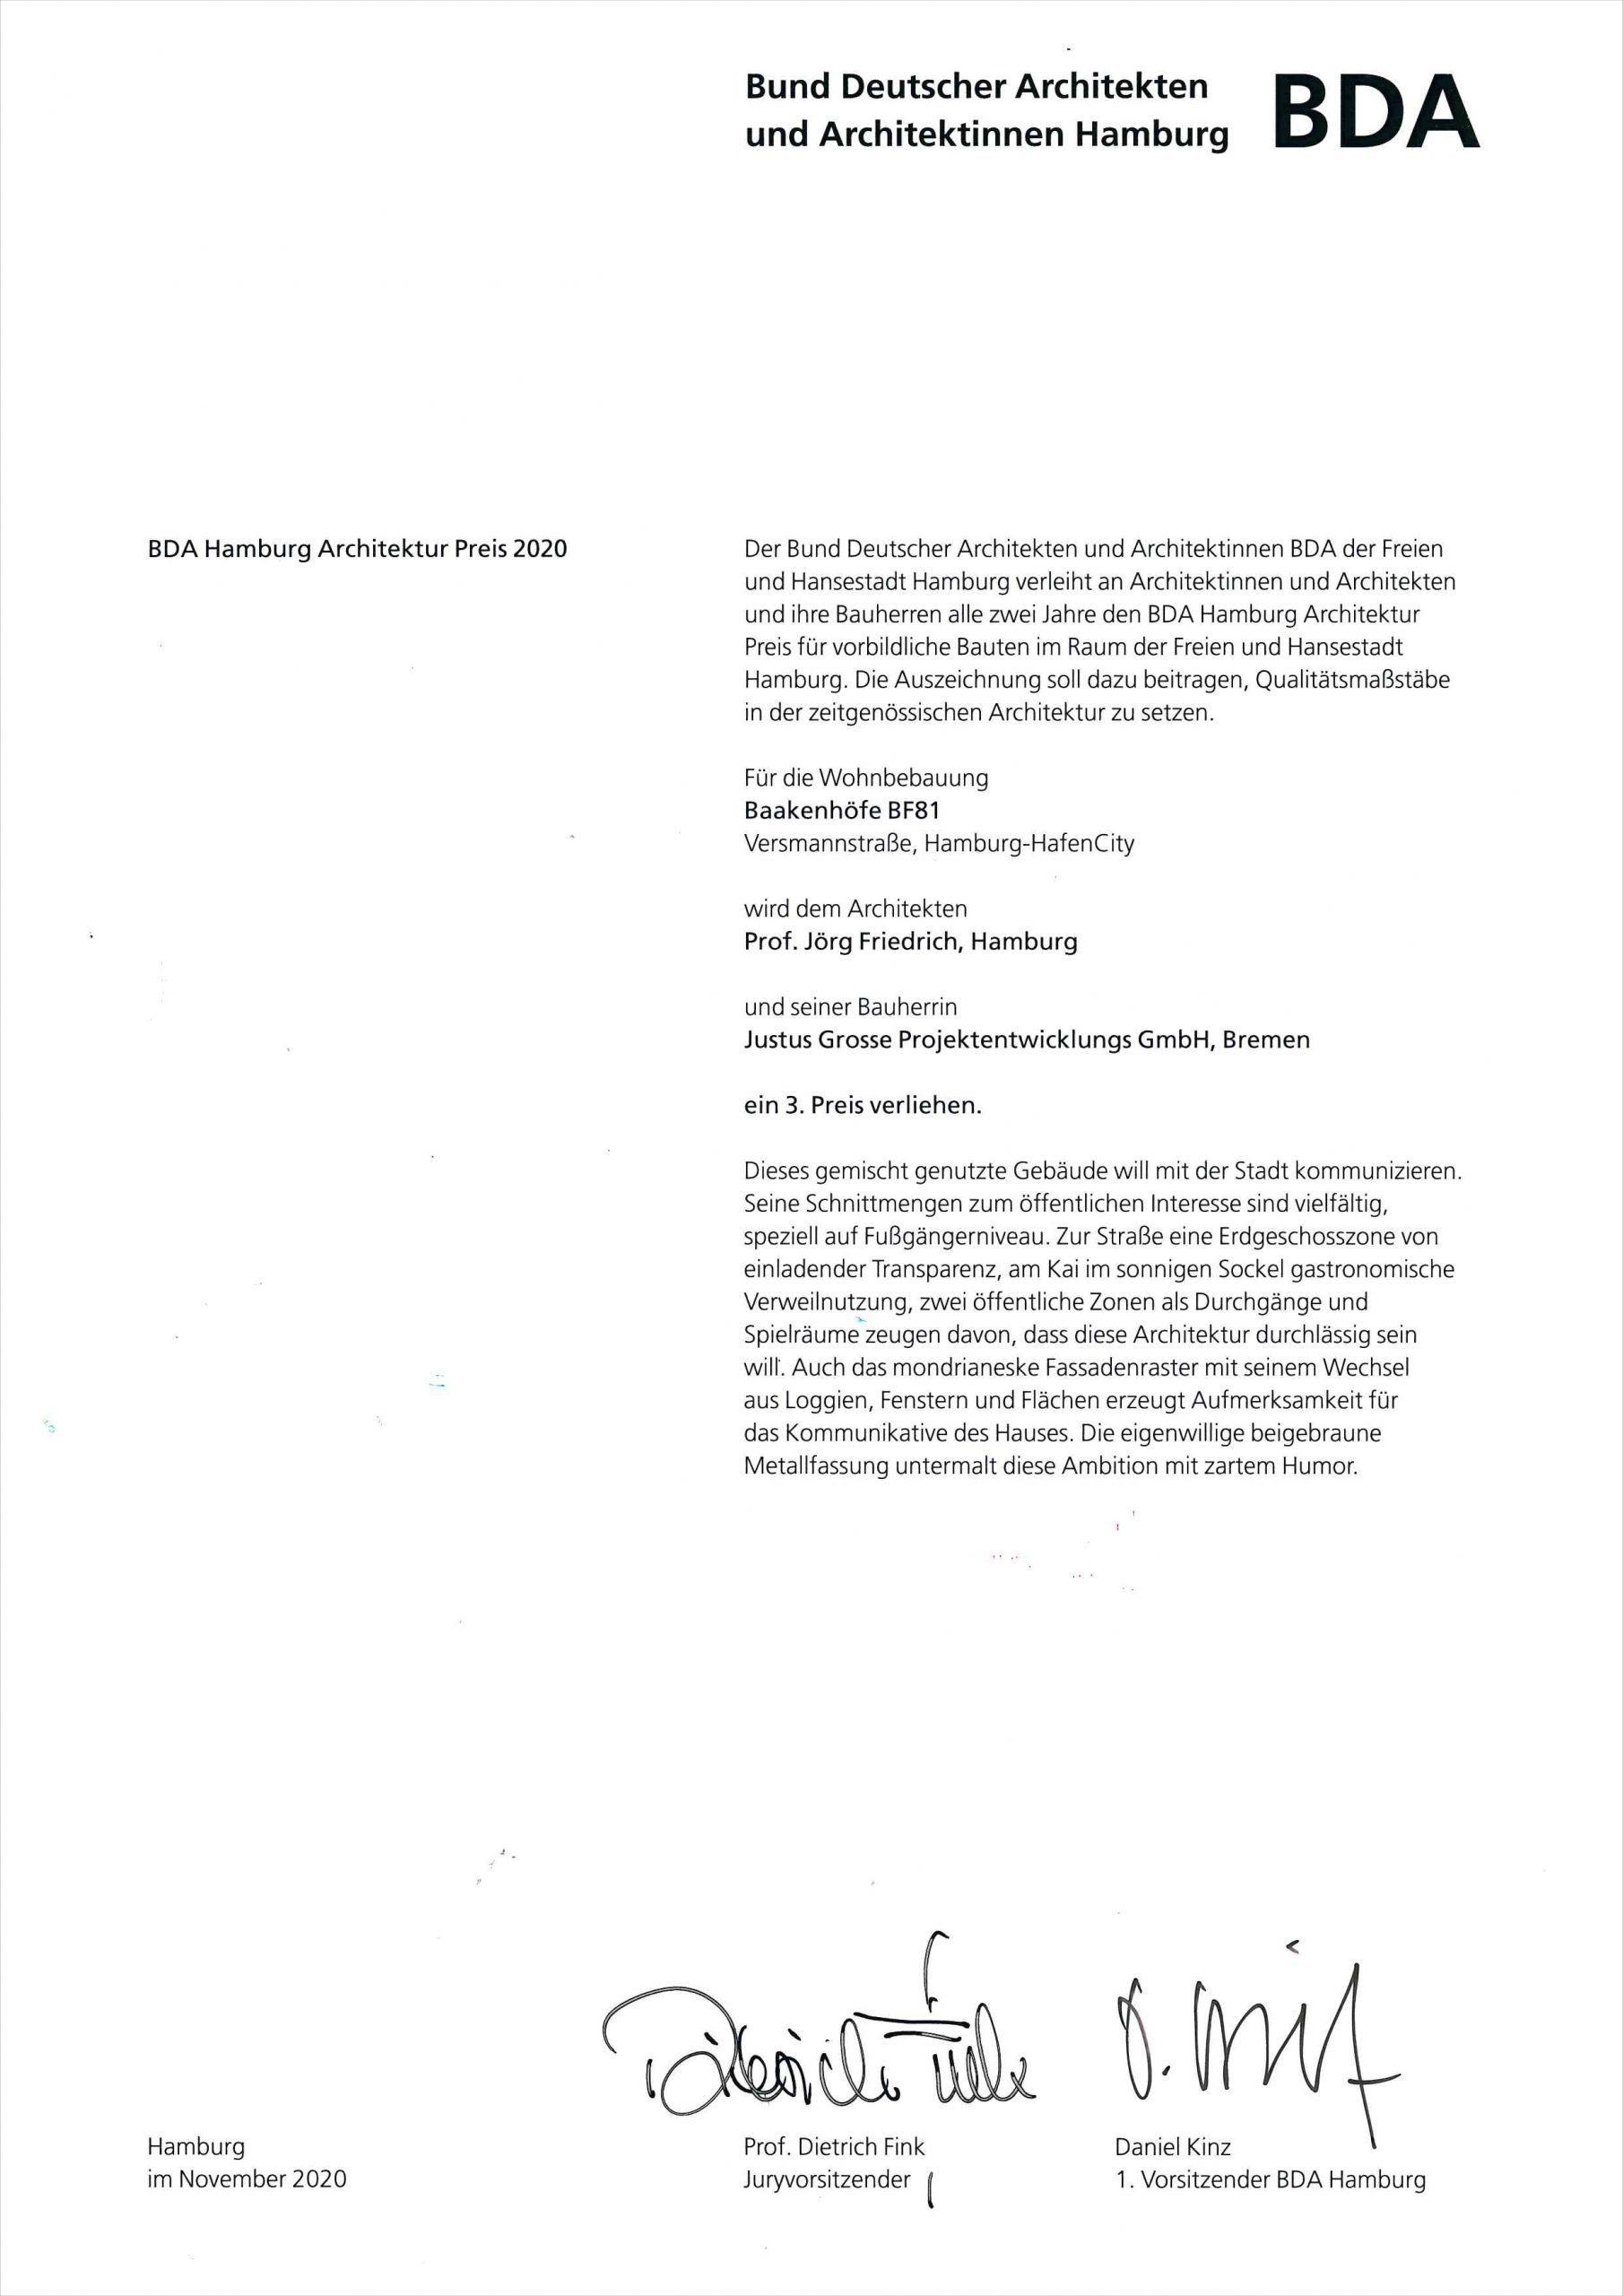 BDA Urkunde 2020 BaakenHafen pfp